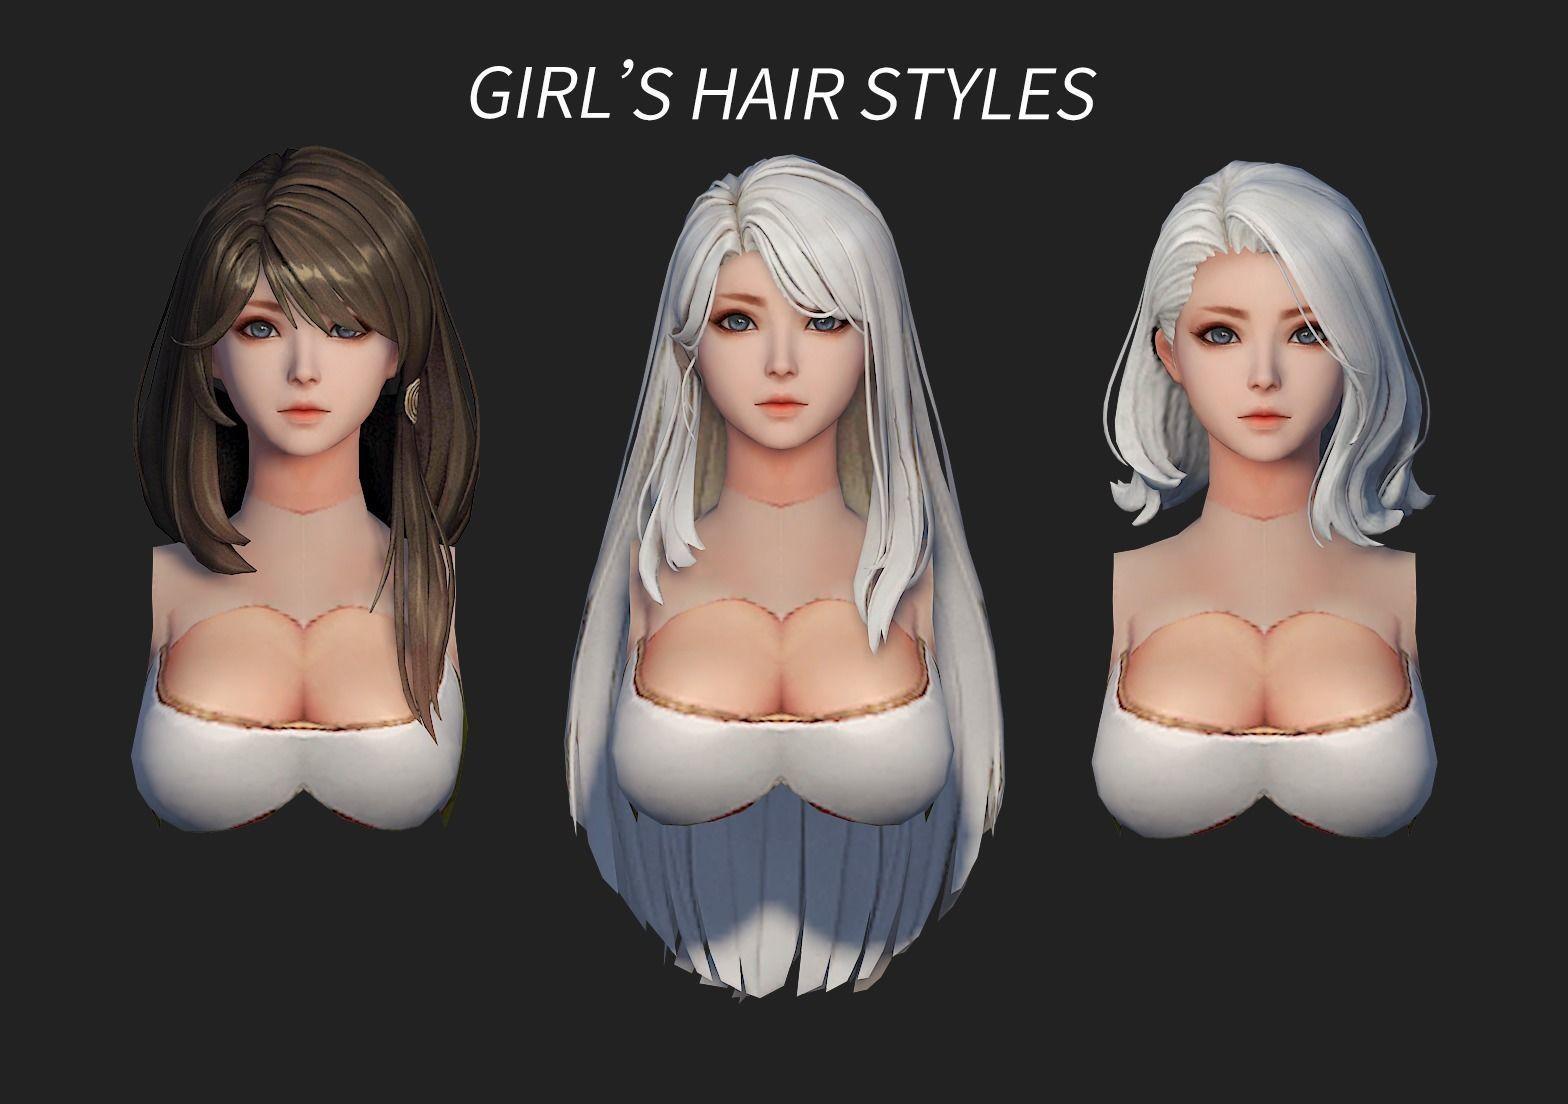 hair style girl short hair cape dye long hair 01